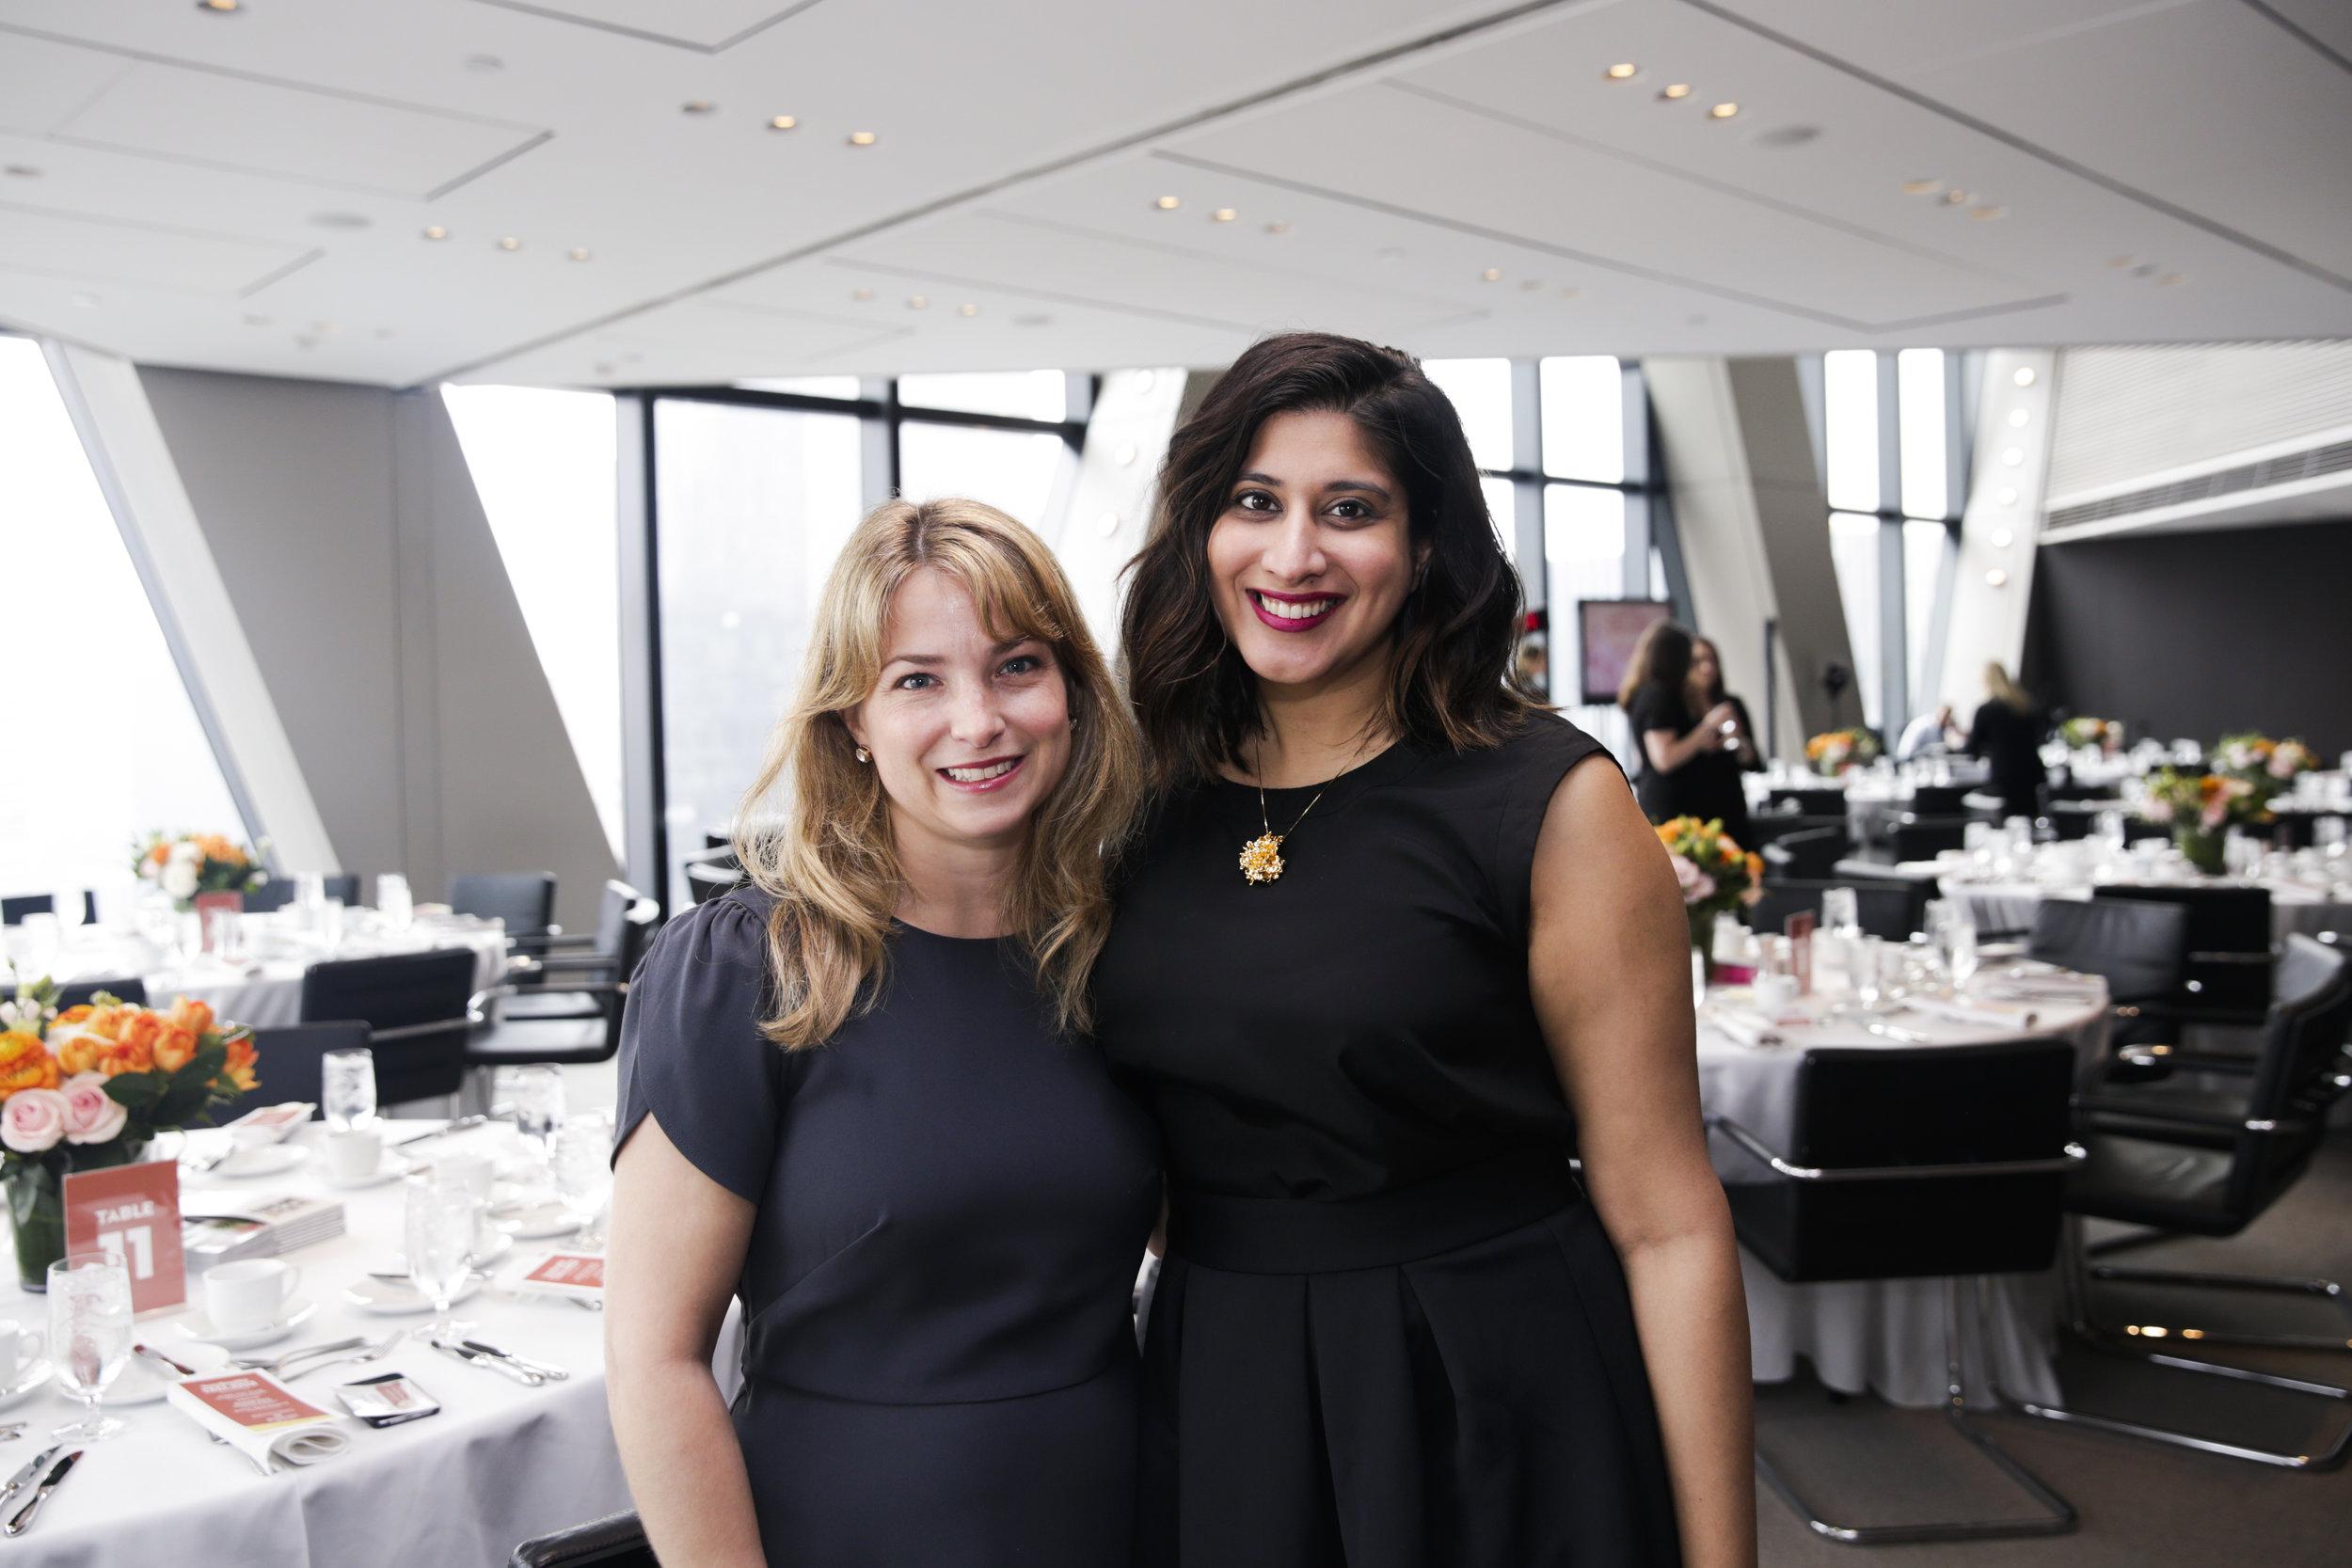 Next Wave Designer honorees Anne Chessin and Tina Ramchandani